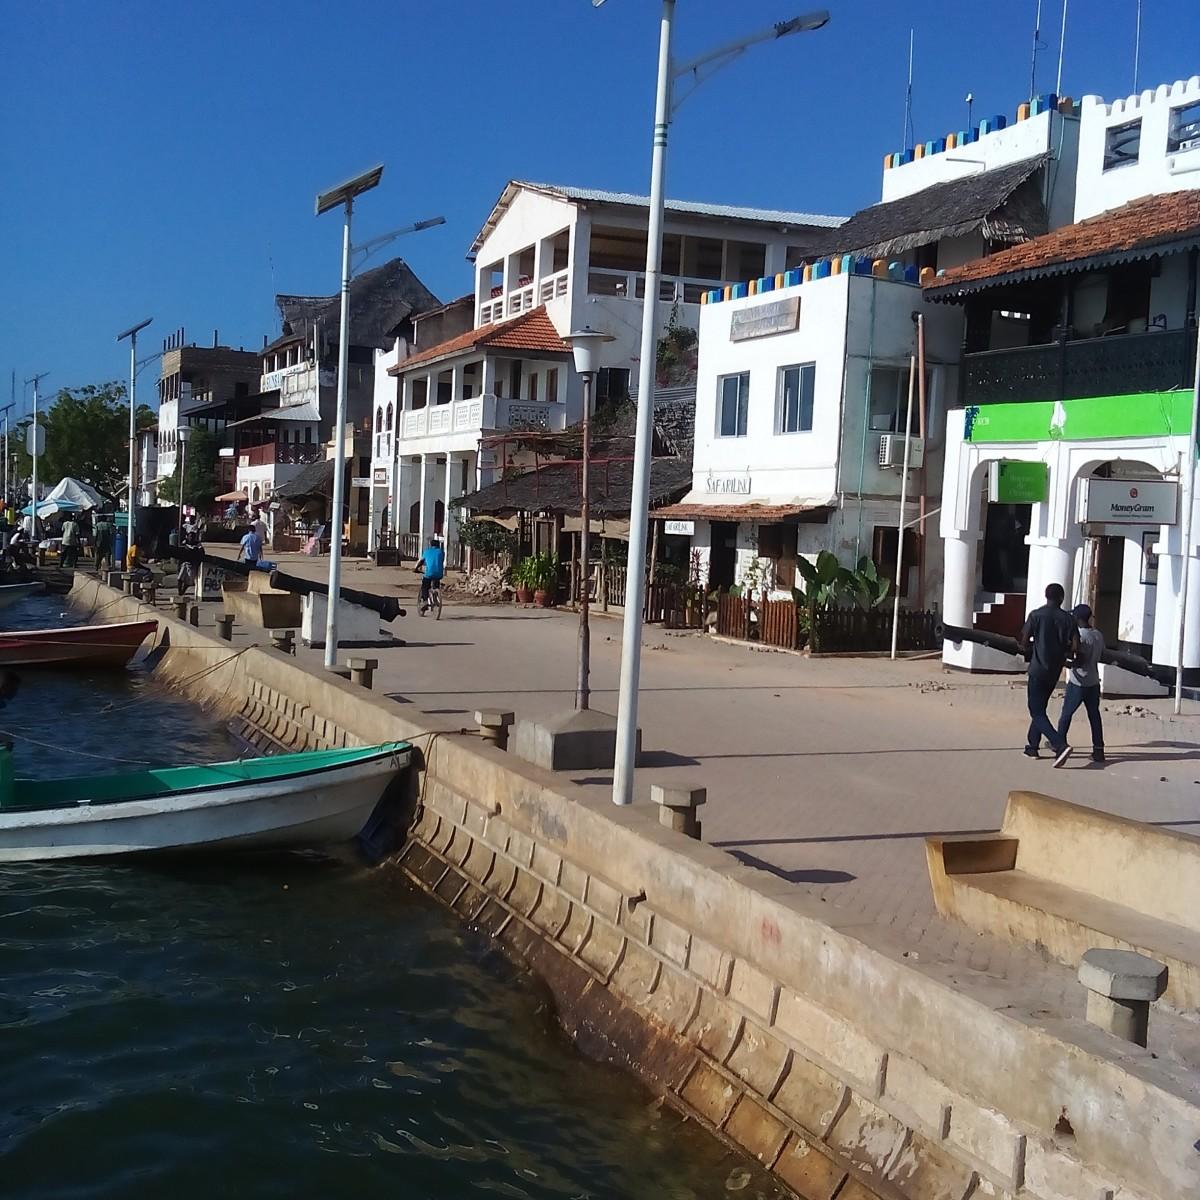 Lamu - an Exotic Island on the East African Coast